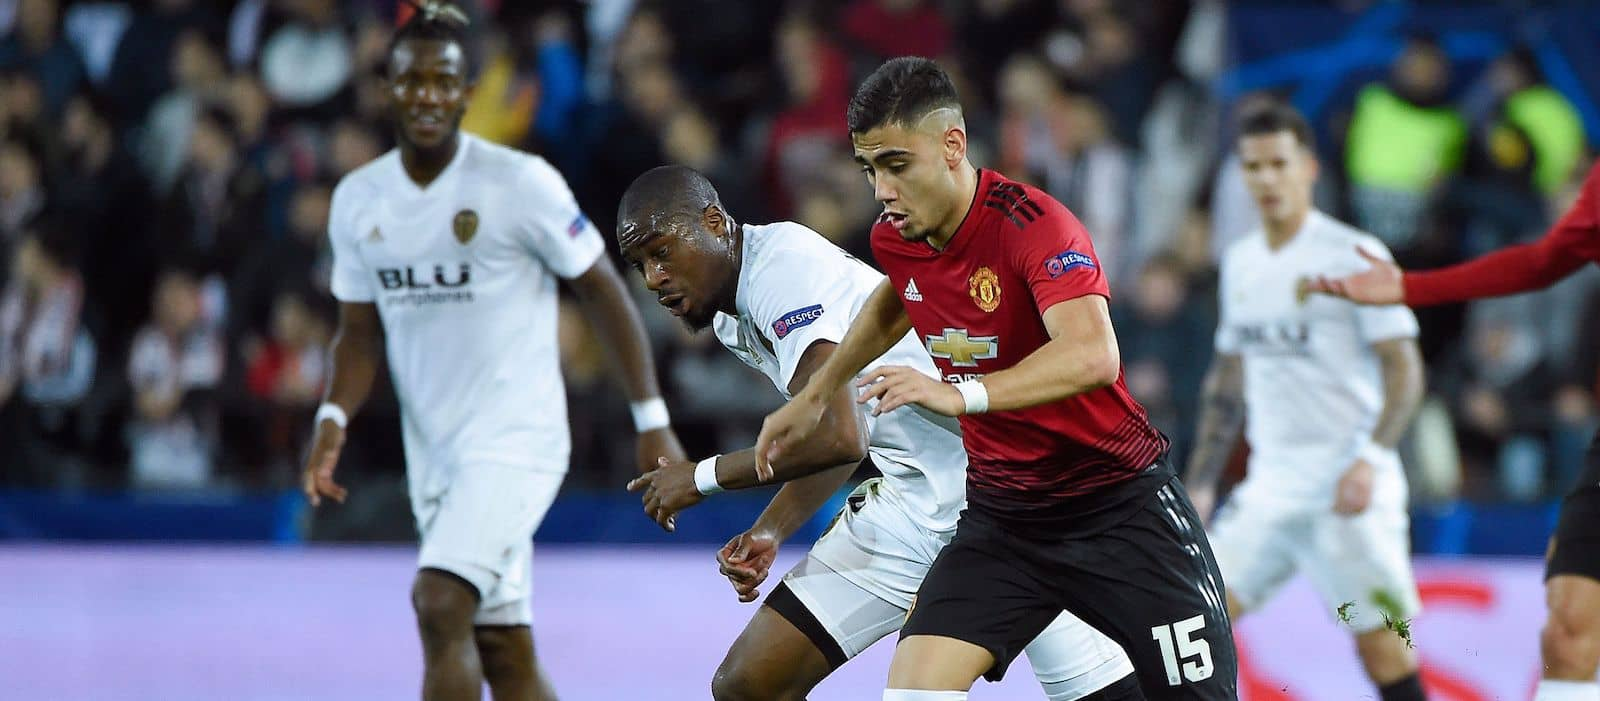 Photo gallery: Valencia 2-1 Manchester United